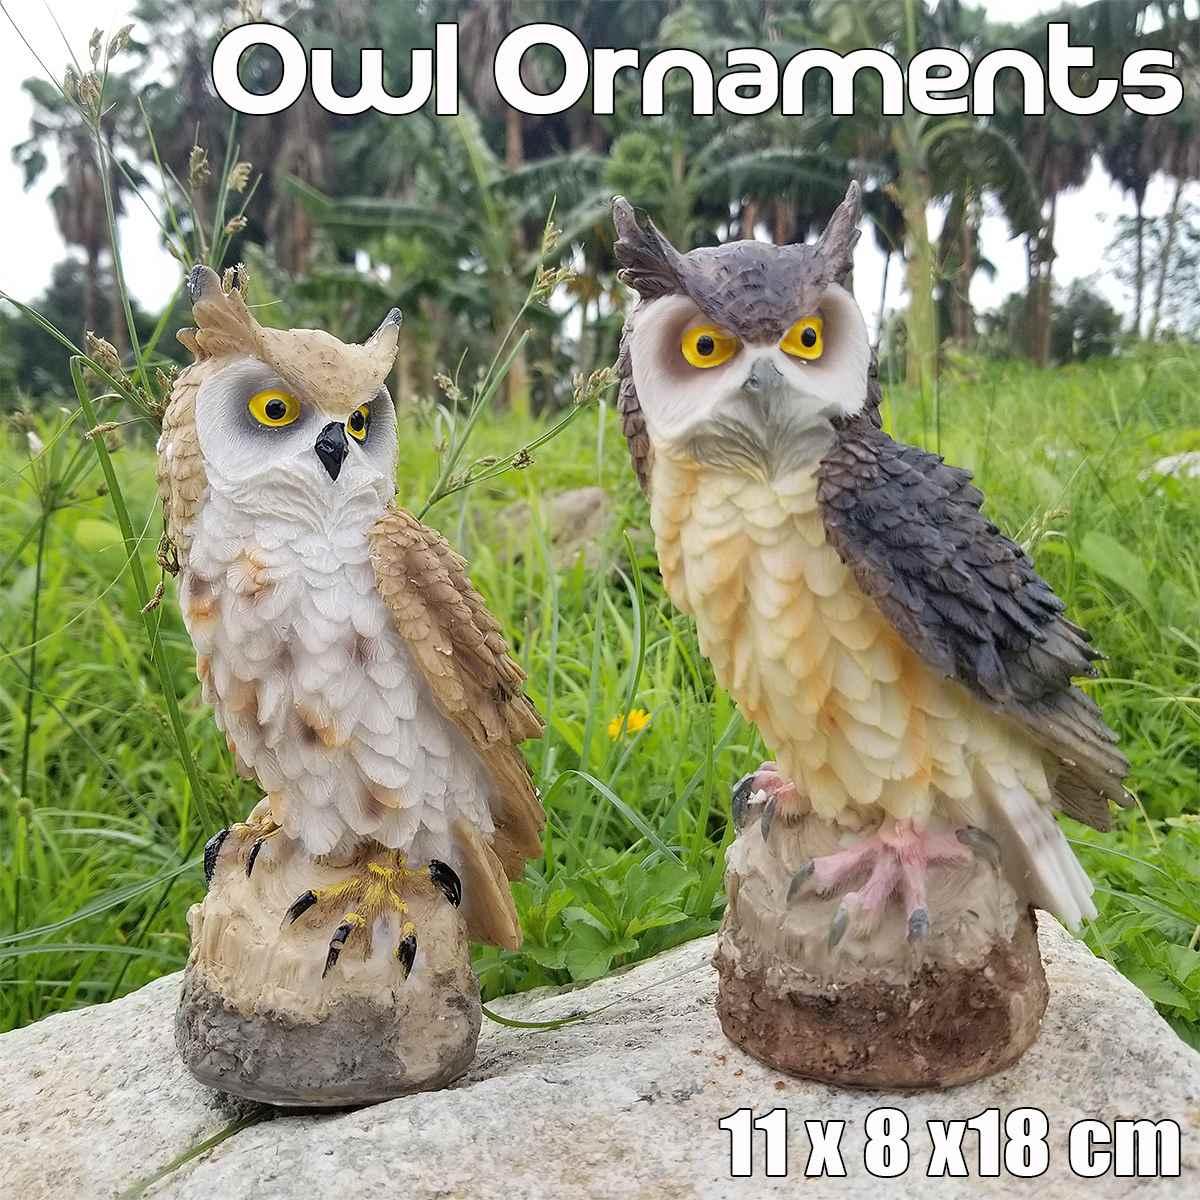 NEW 11x8x18cm Synthetic Resin Miniature Owl Bird Animal Model Toy Figurine Indoor Outdoor Home Garden Decor Pest Bird Ornament